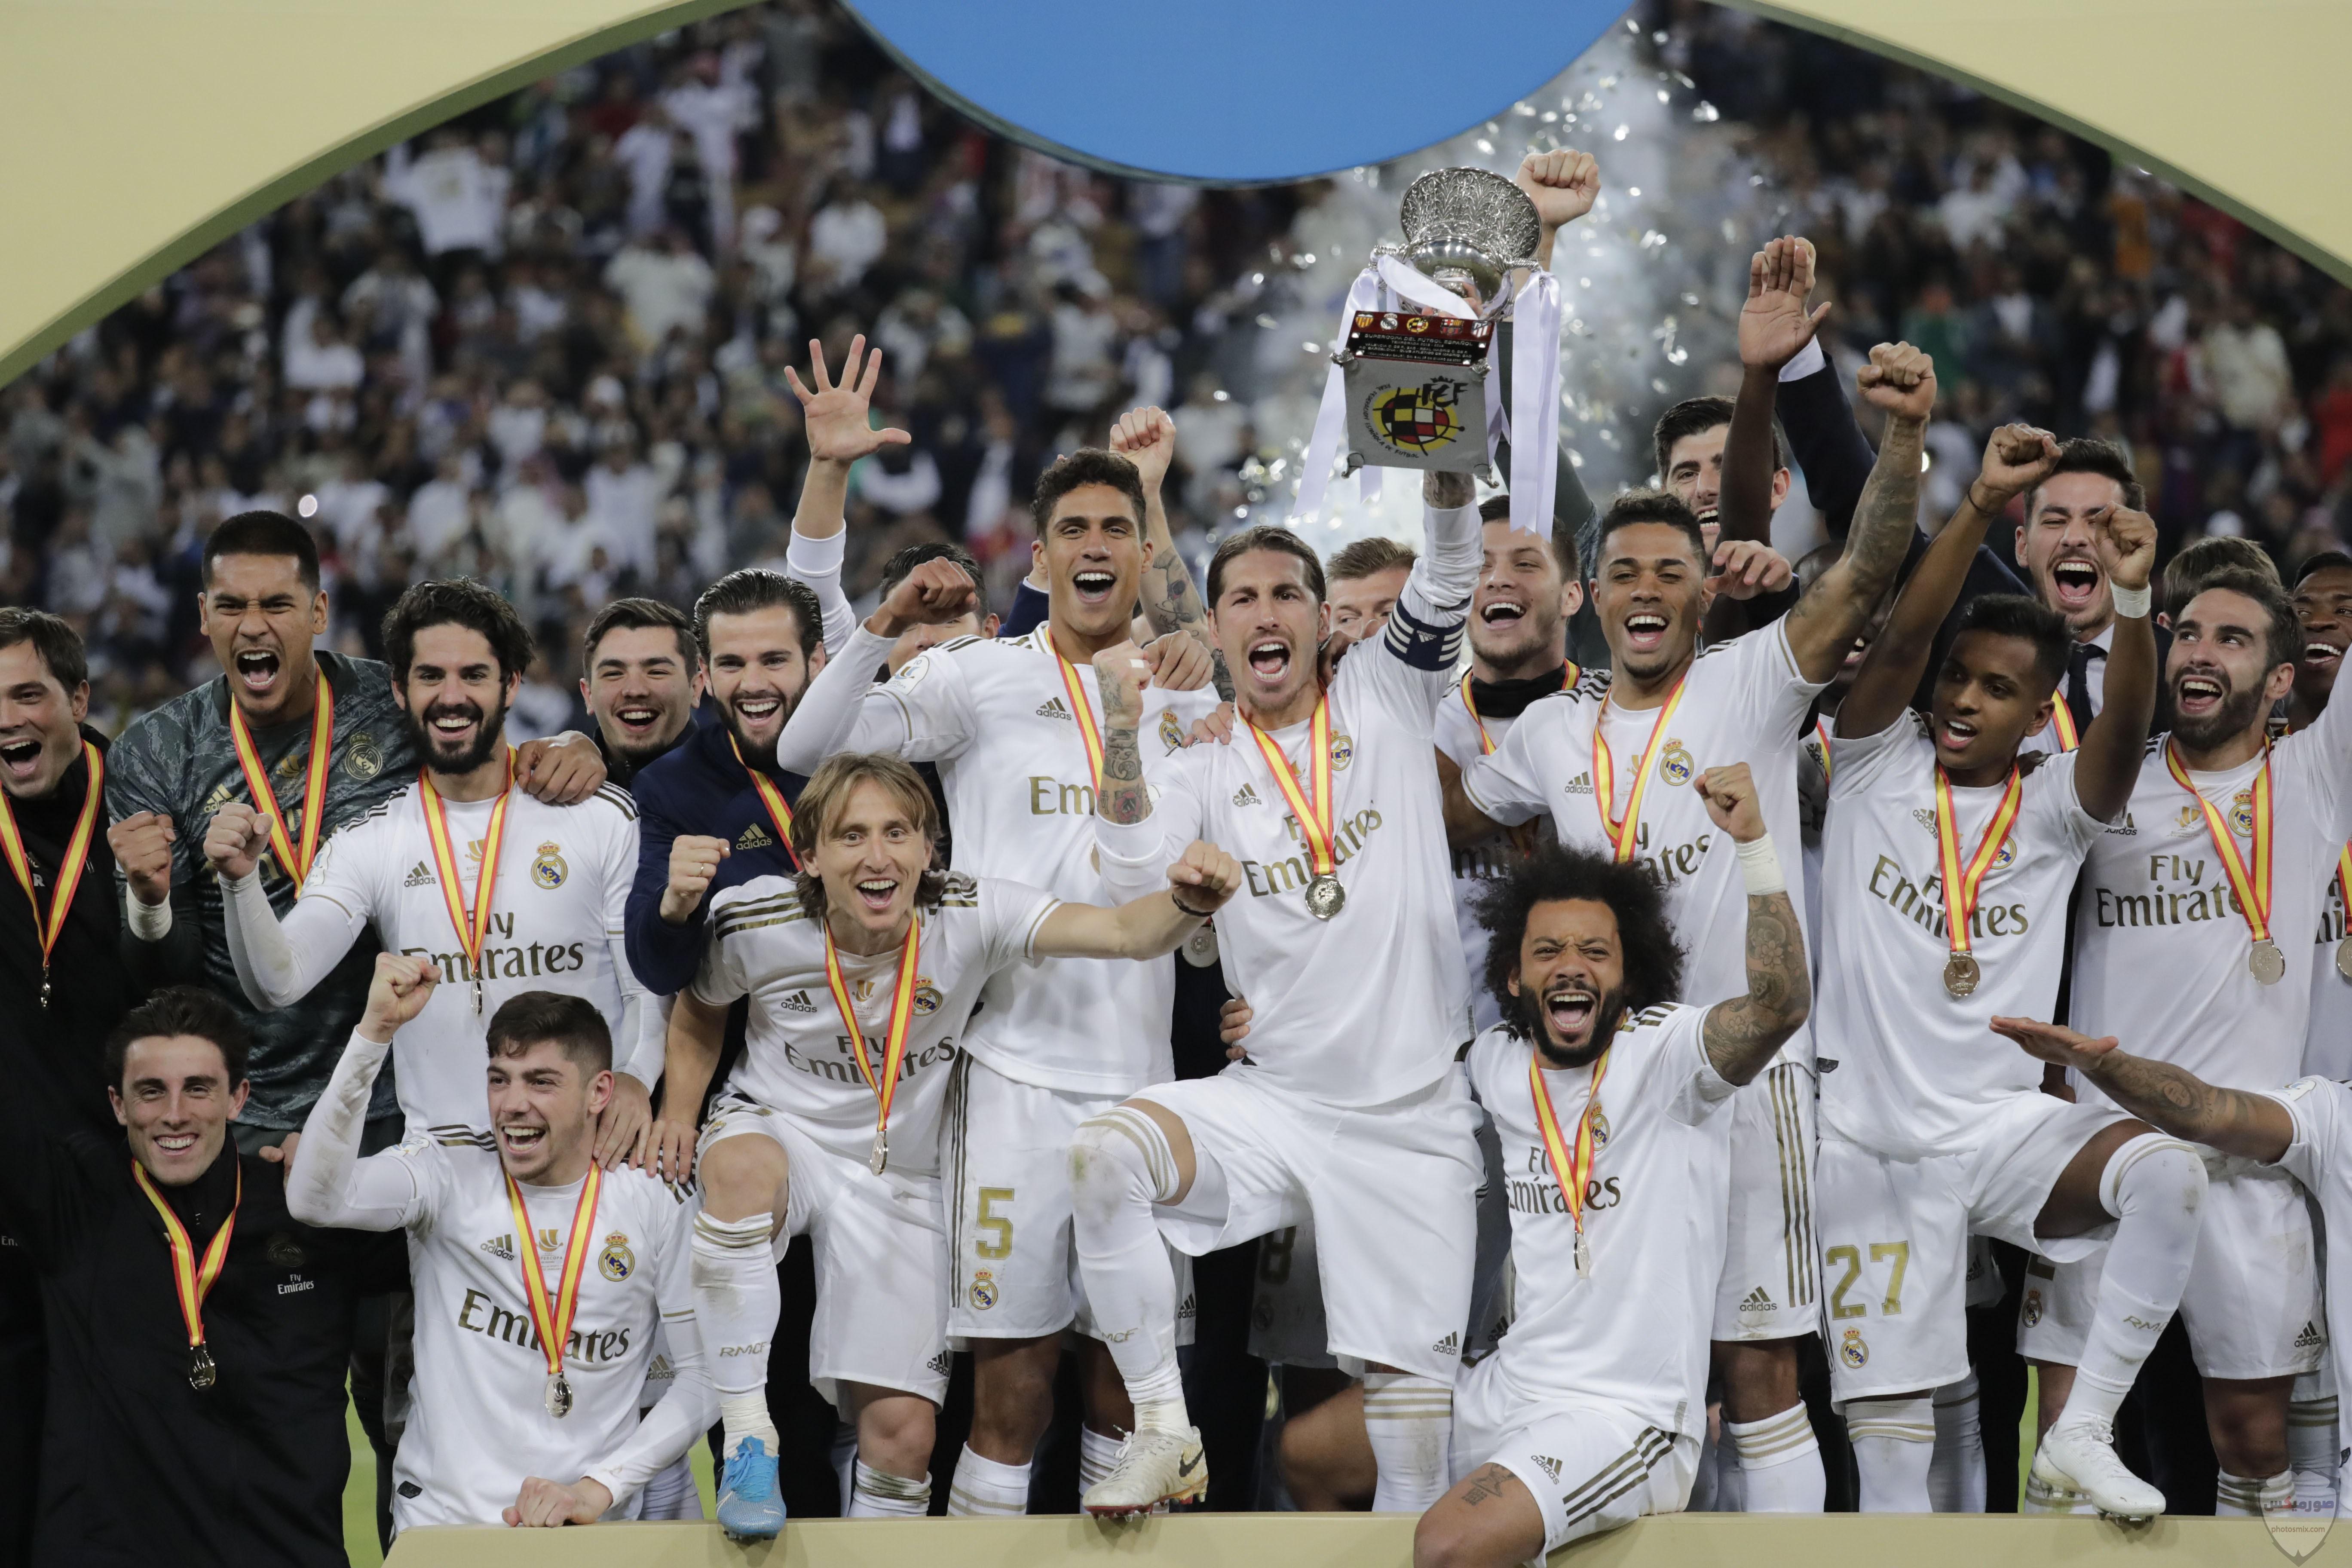 صور ريال مدريد 2020خلفيات ورمزيات ريال مدريد صور لاعبي ريال مدريد real madrid 4